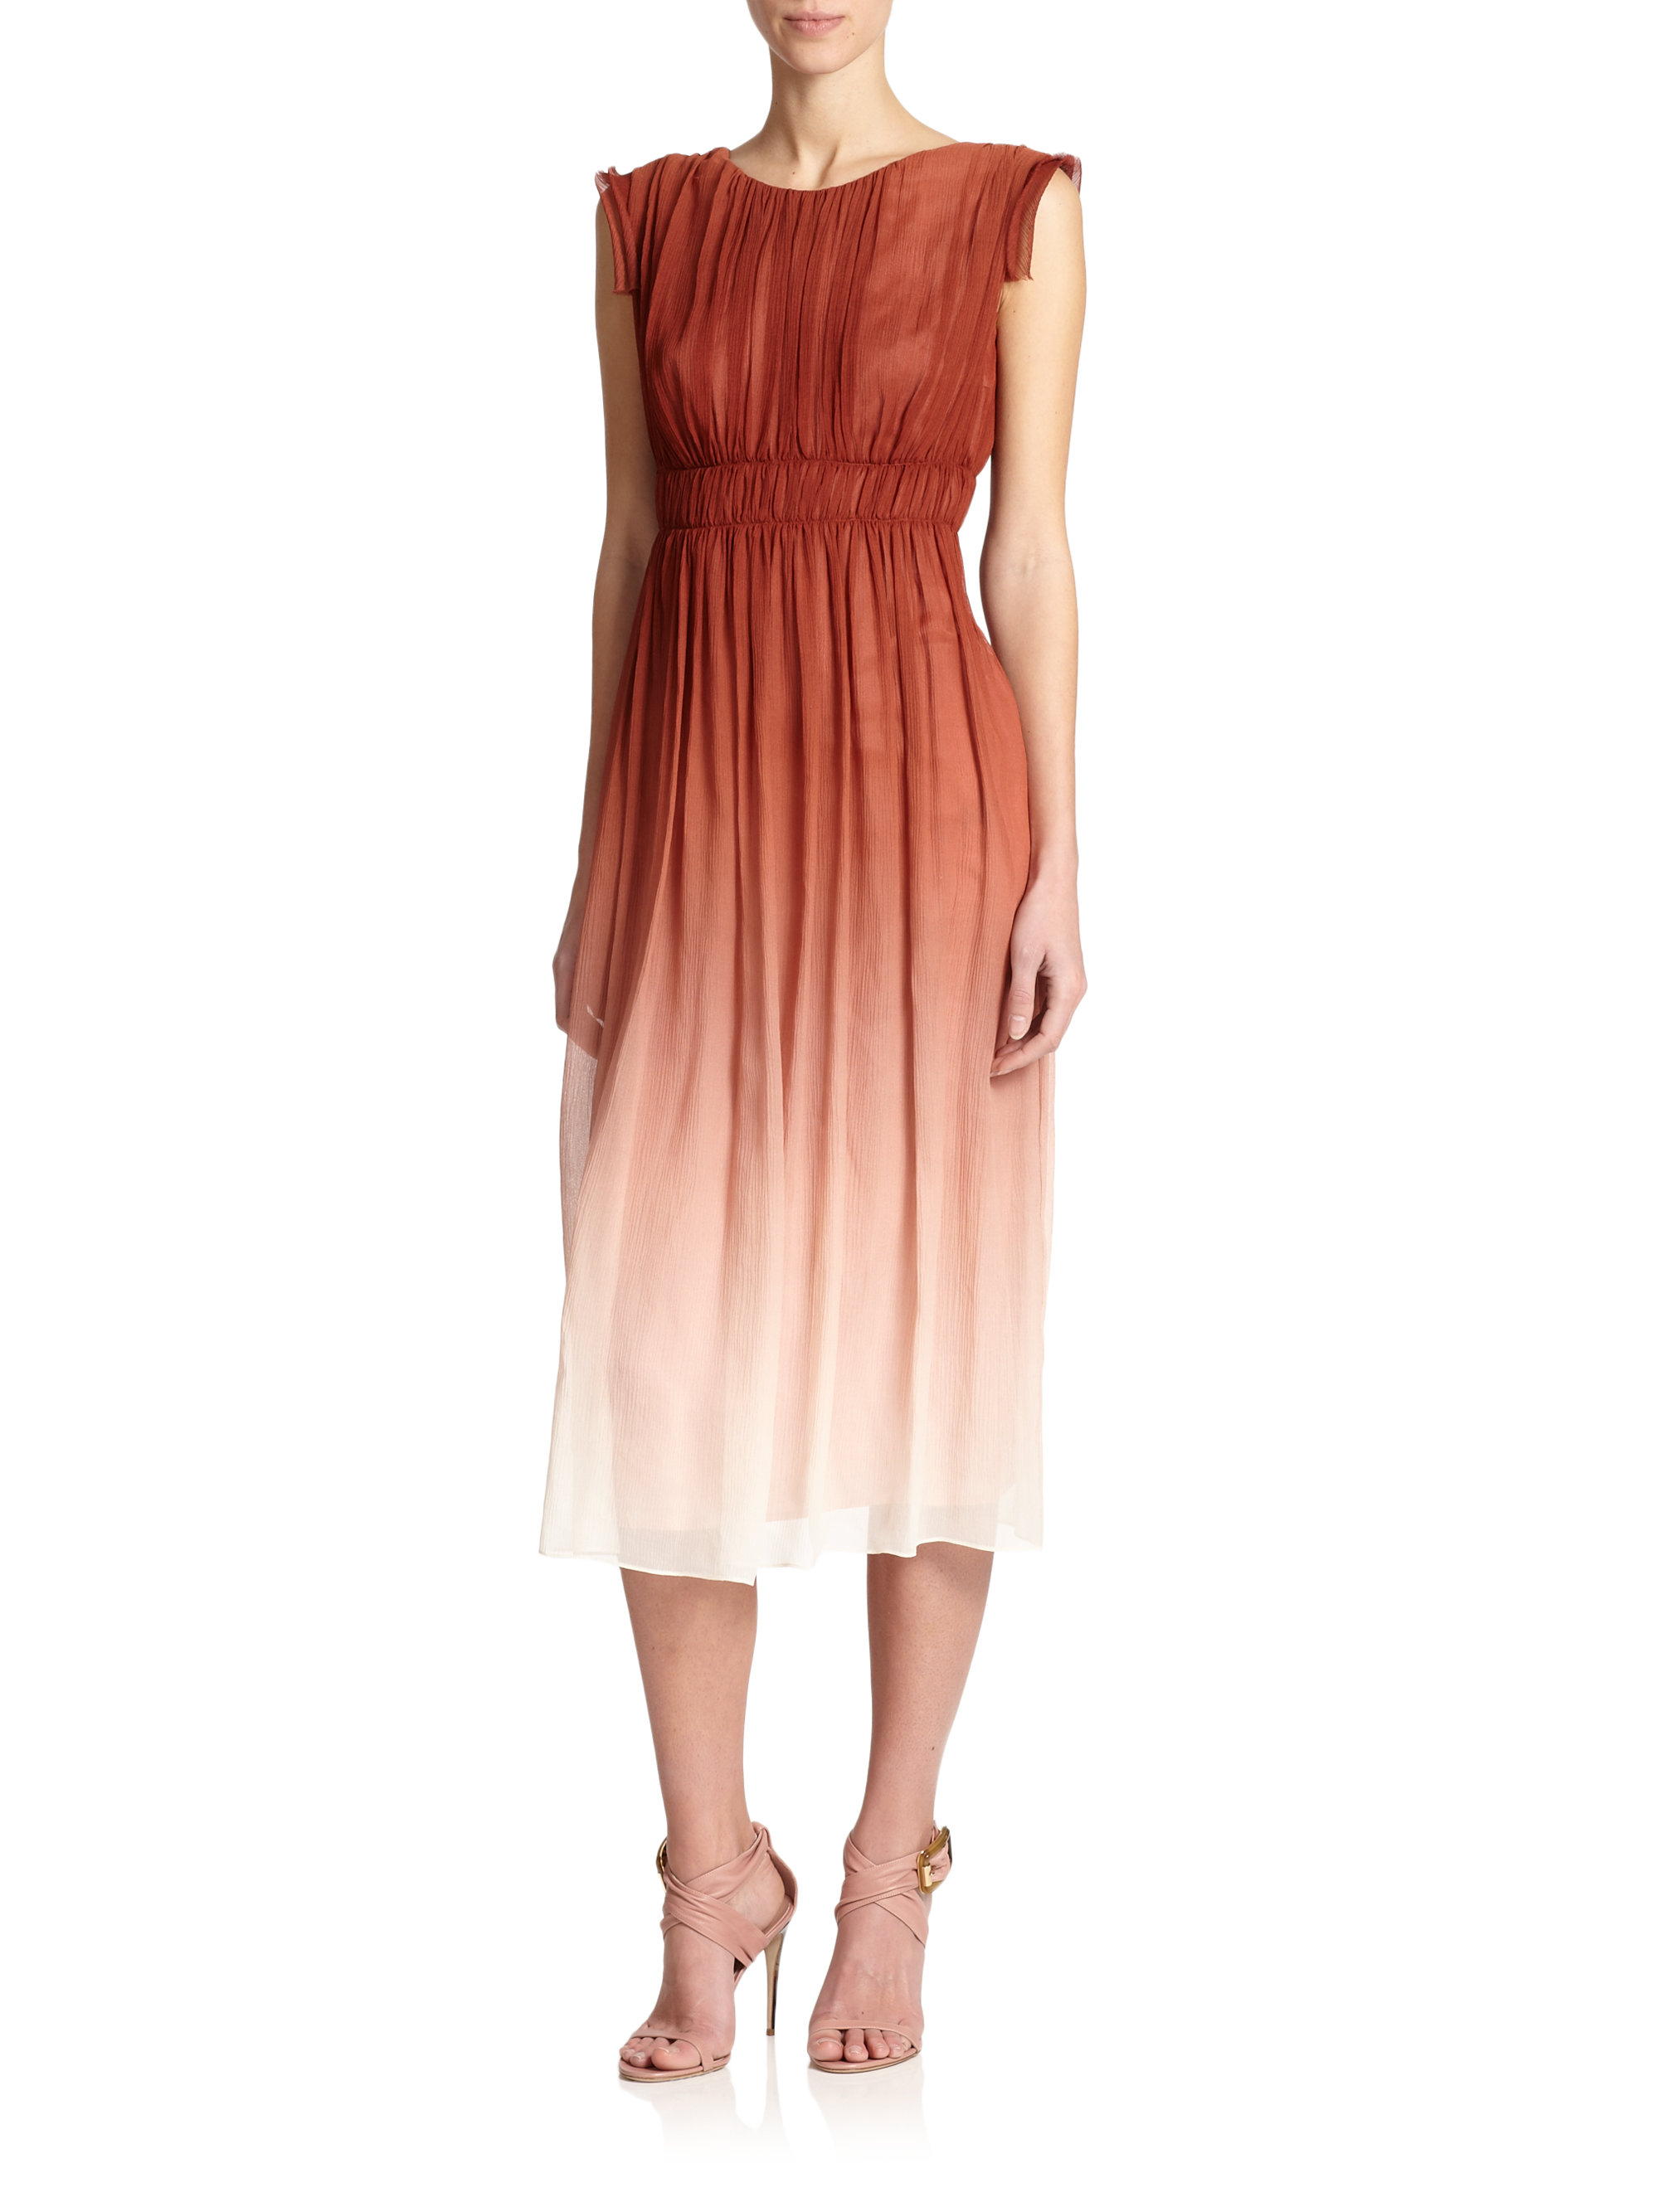 Burberry Elsie Ombr Silk Dress In Pink Lyst